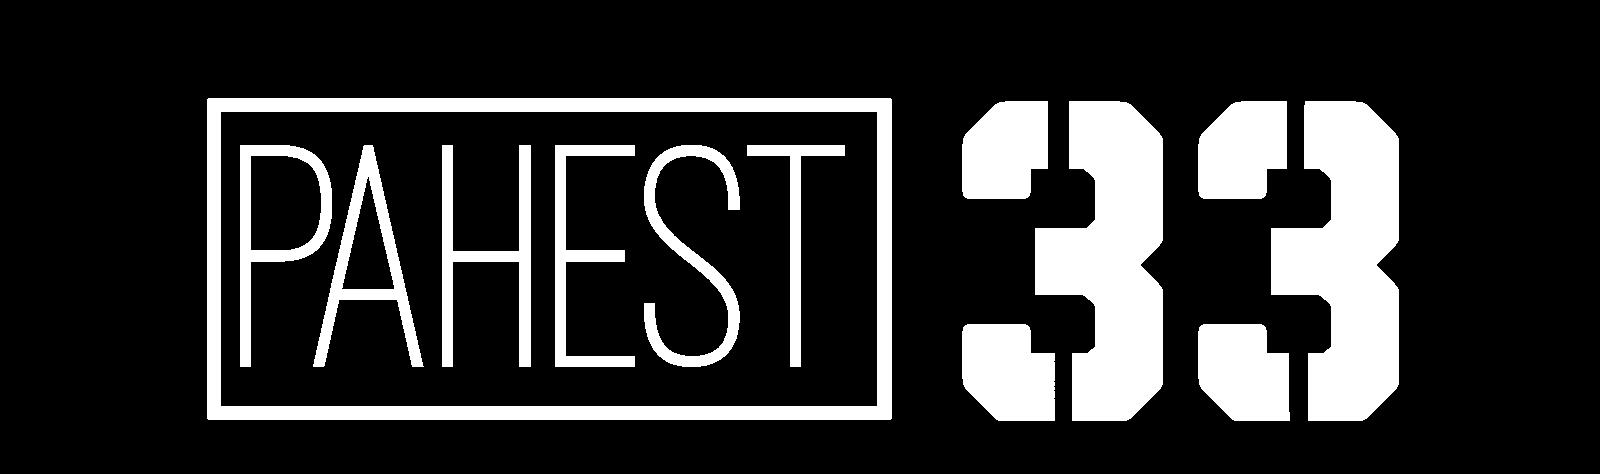 Pahest33